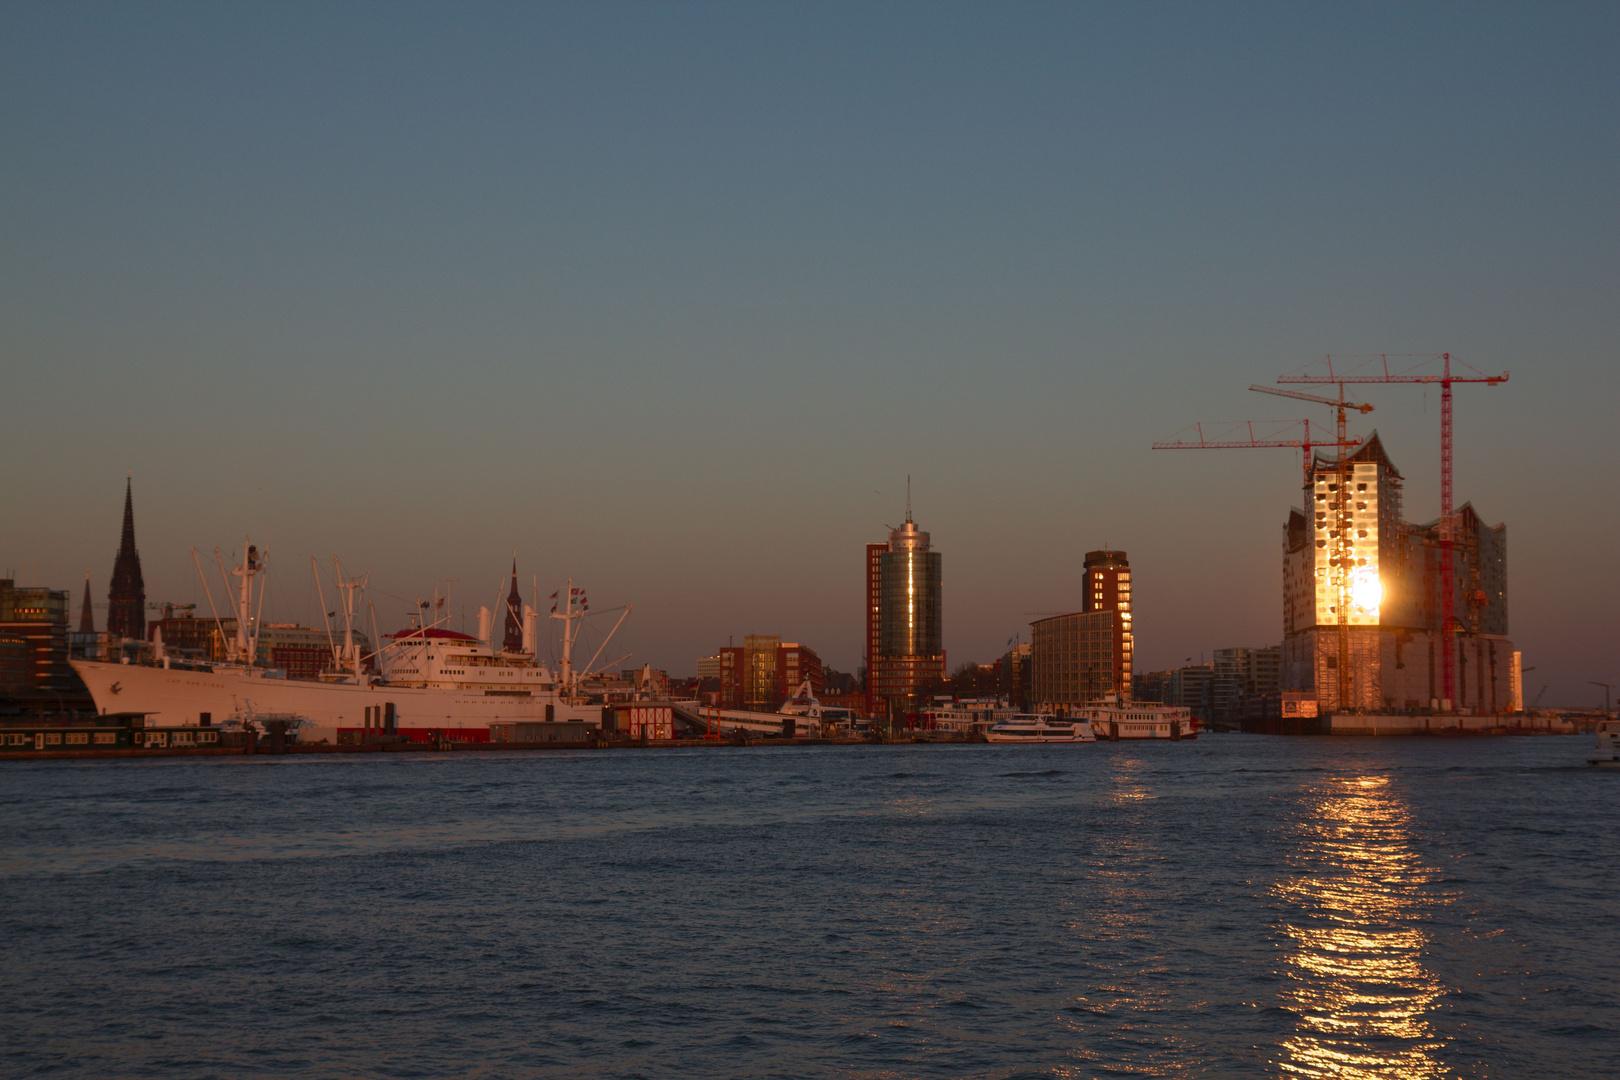 Elbphilharmonie Sonnenuntergang